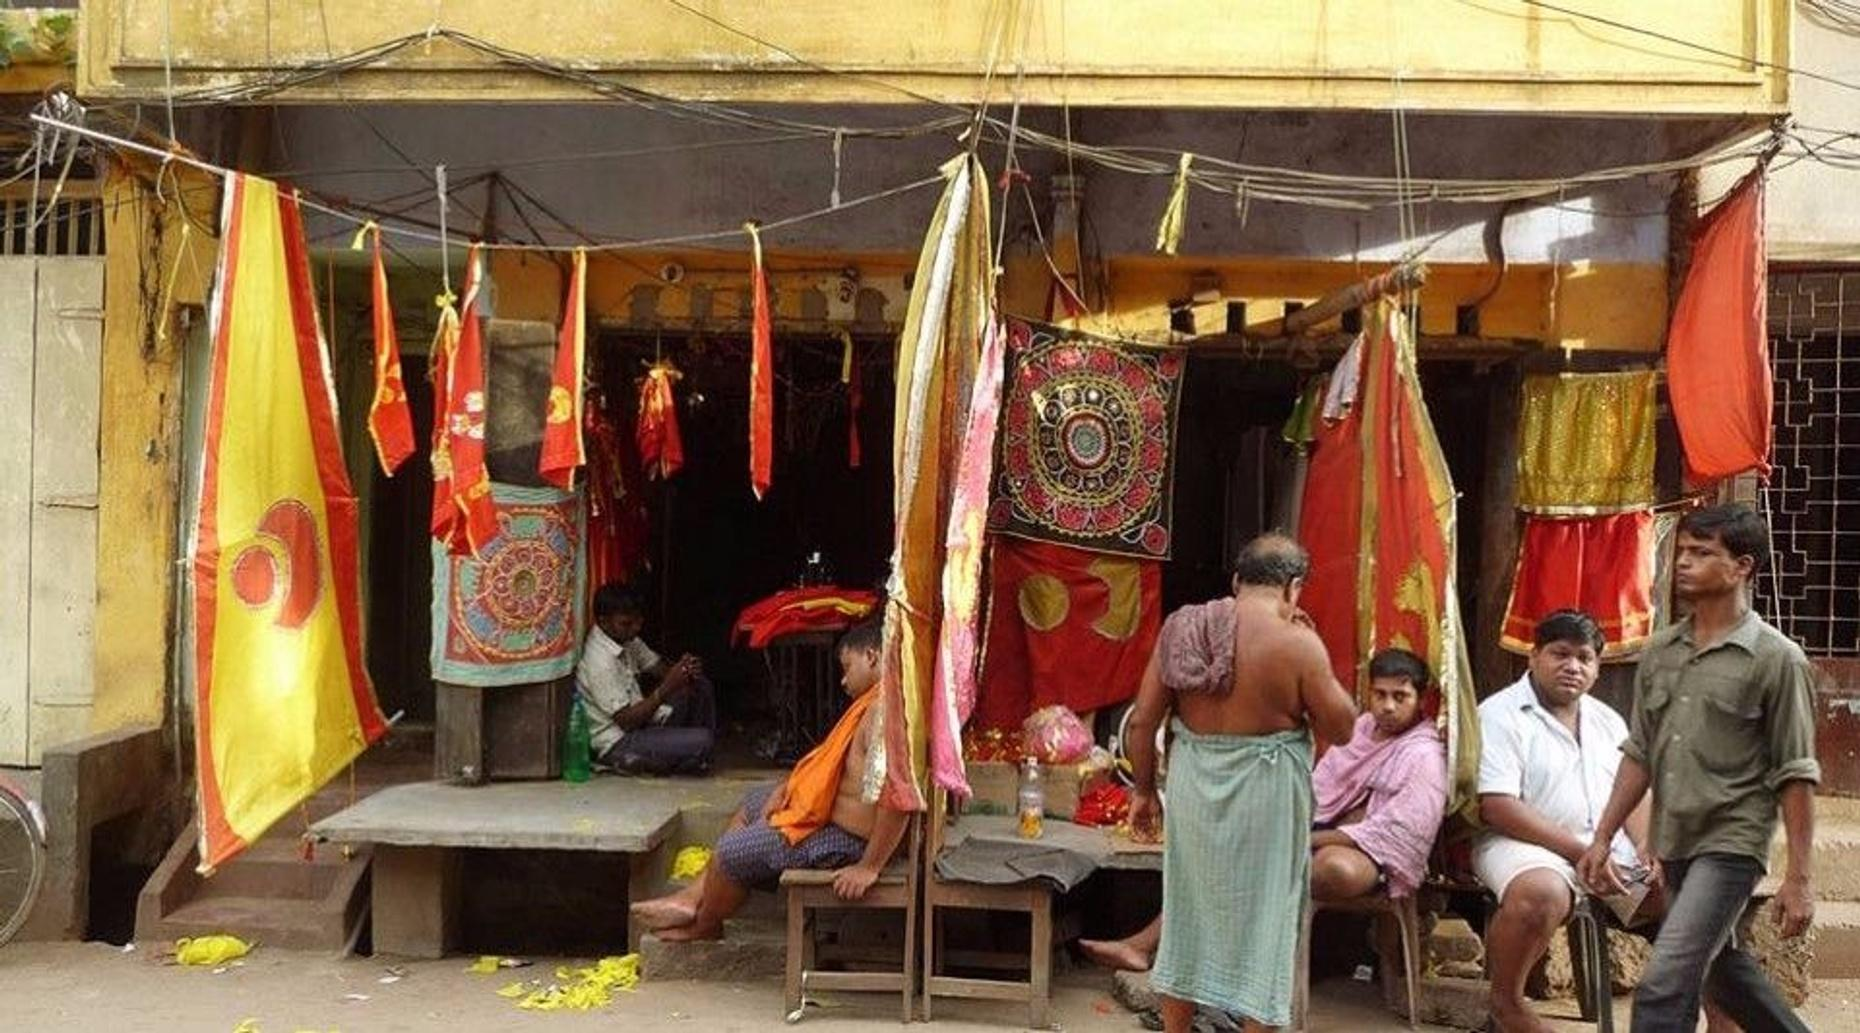 Konark Sun Temple & Pipli Village Tour from Bhubaneswar